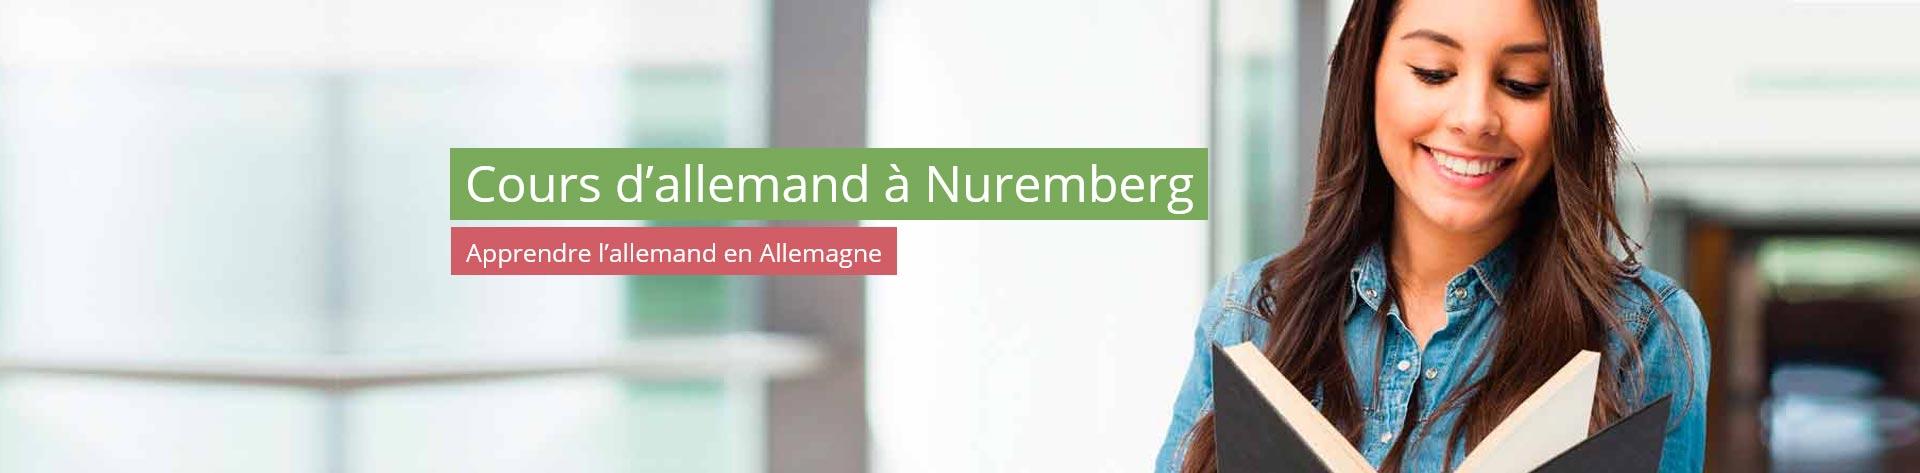 Cours d'allemand à Nuremberg – Apprendre l'allemand en Allemagne